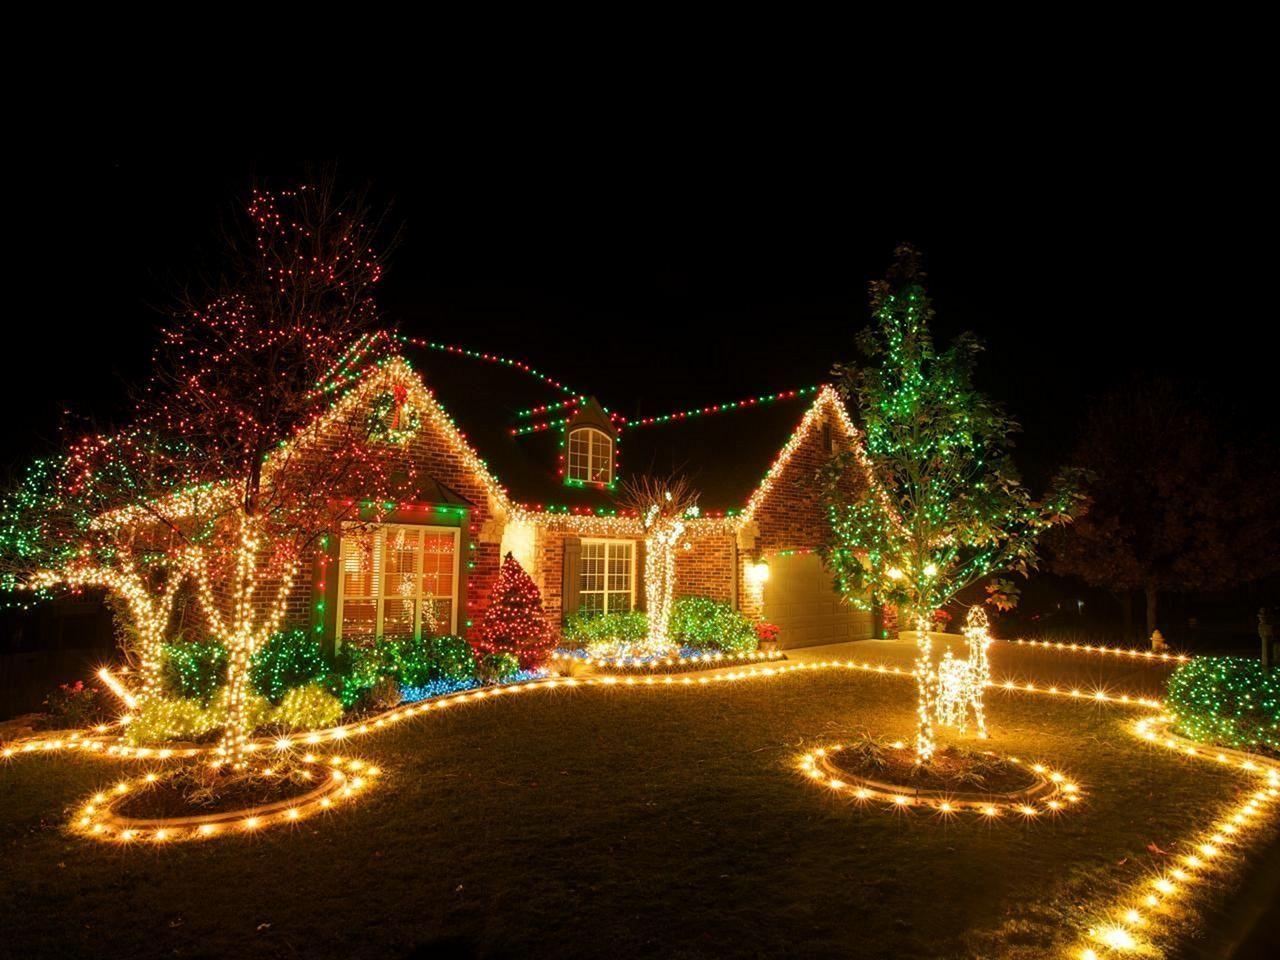 35 Awesome Backyard Design With Christmas Lights Ideas Dexorate Outdoor Christmas Diy Diy Christmas Lights Outdoor Christmas